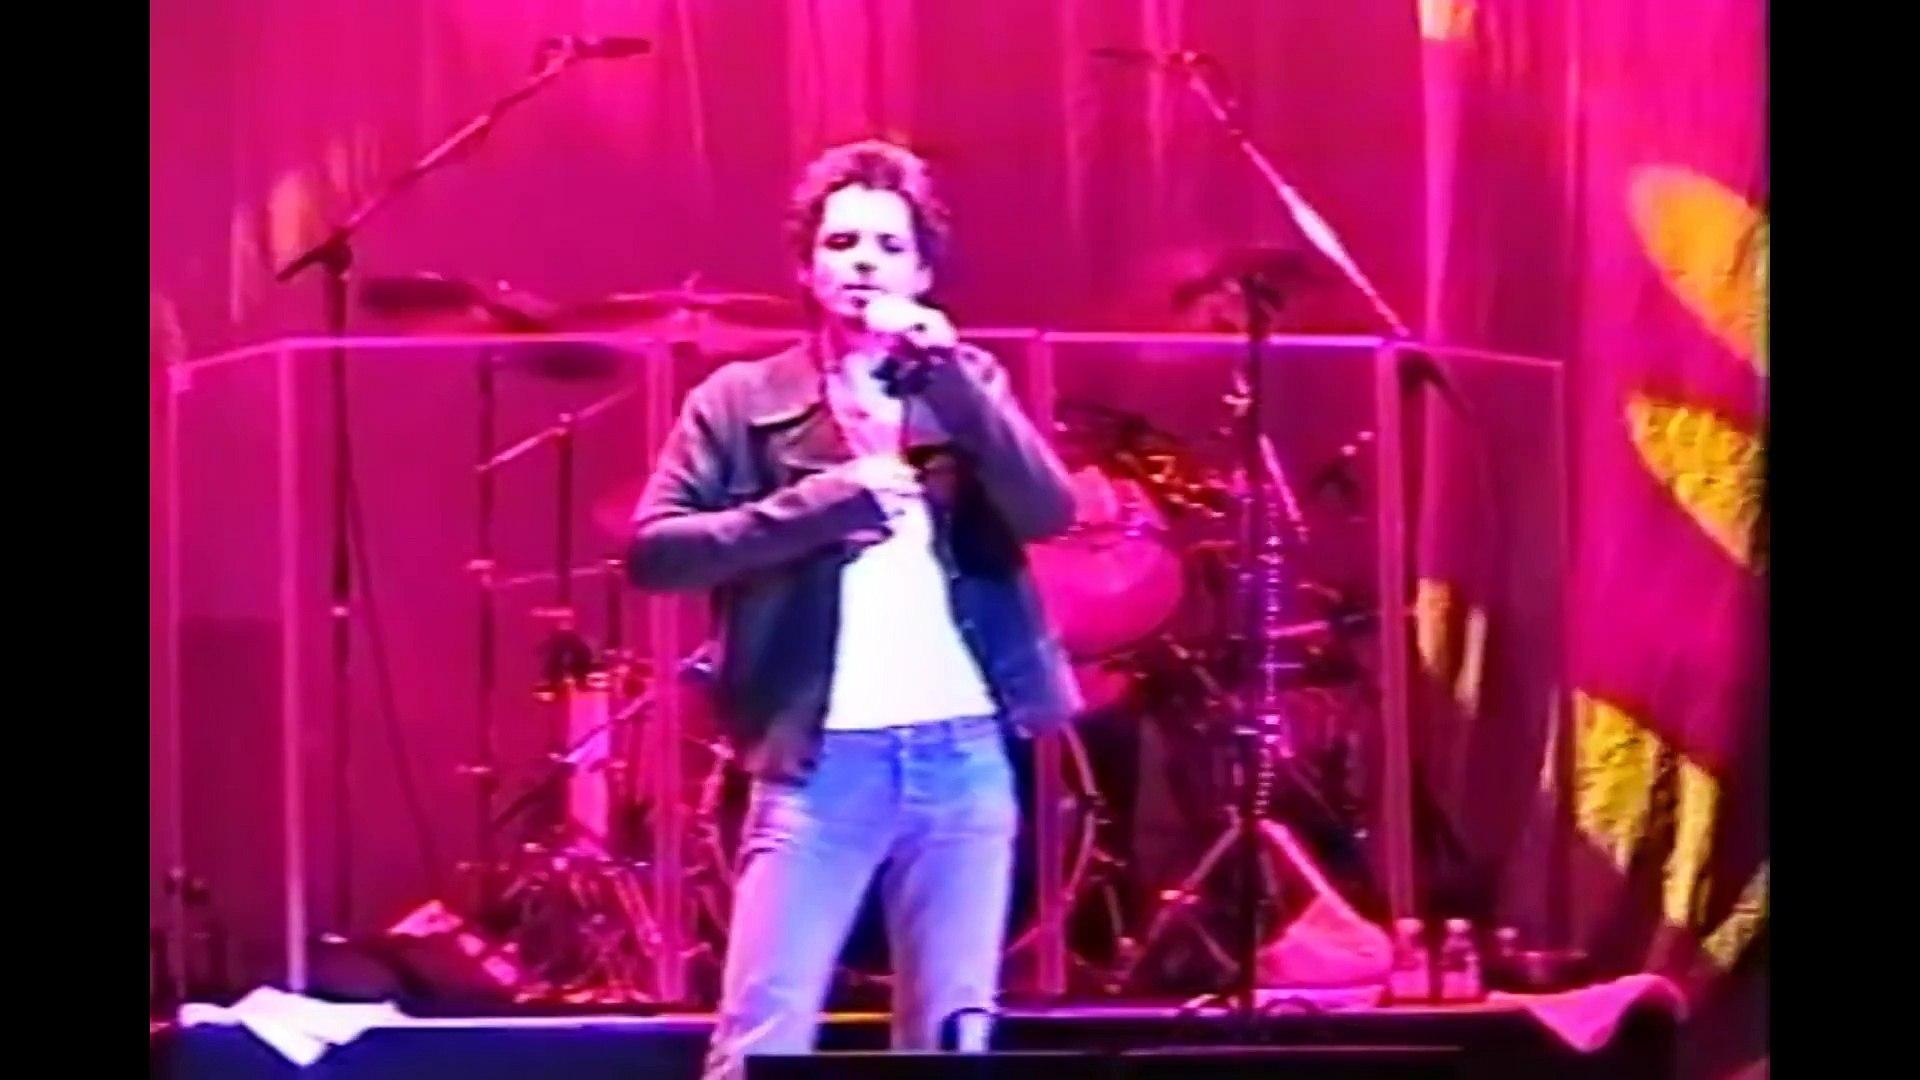 Chris Cornell - 03.07.00 Euphoria Morning Tour - Pro Shot Complete Concert - SBD Audio